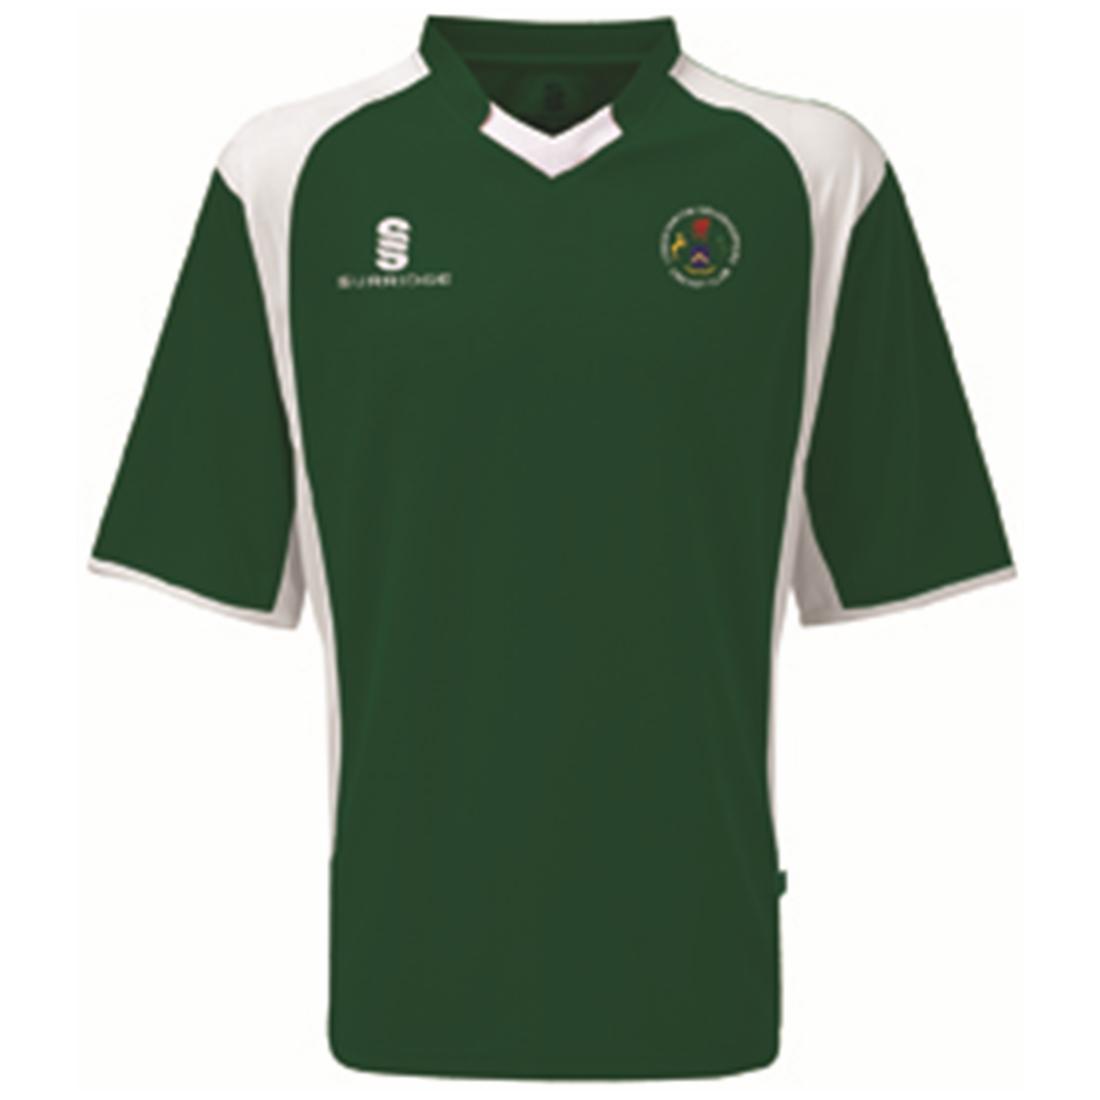 LGCC Training Shirt Jnr